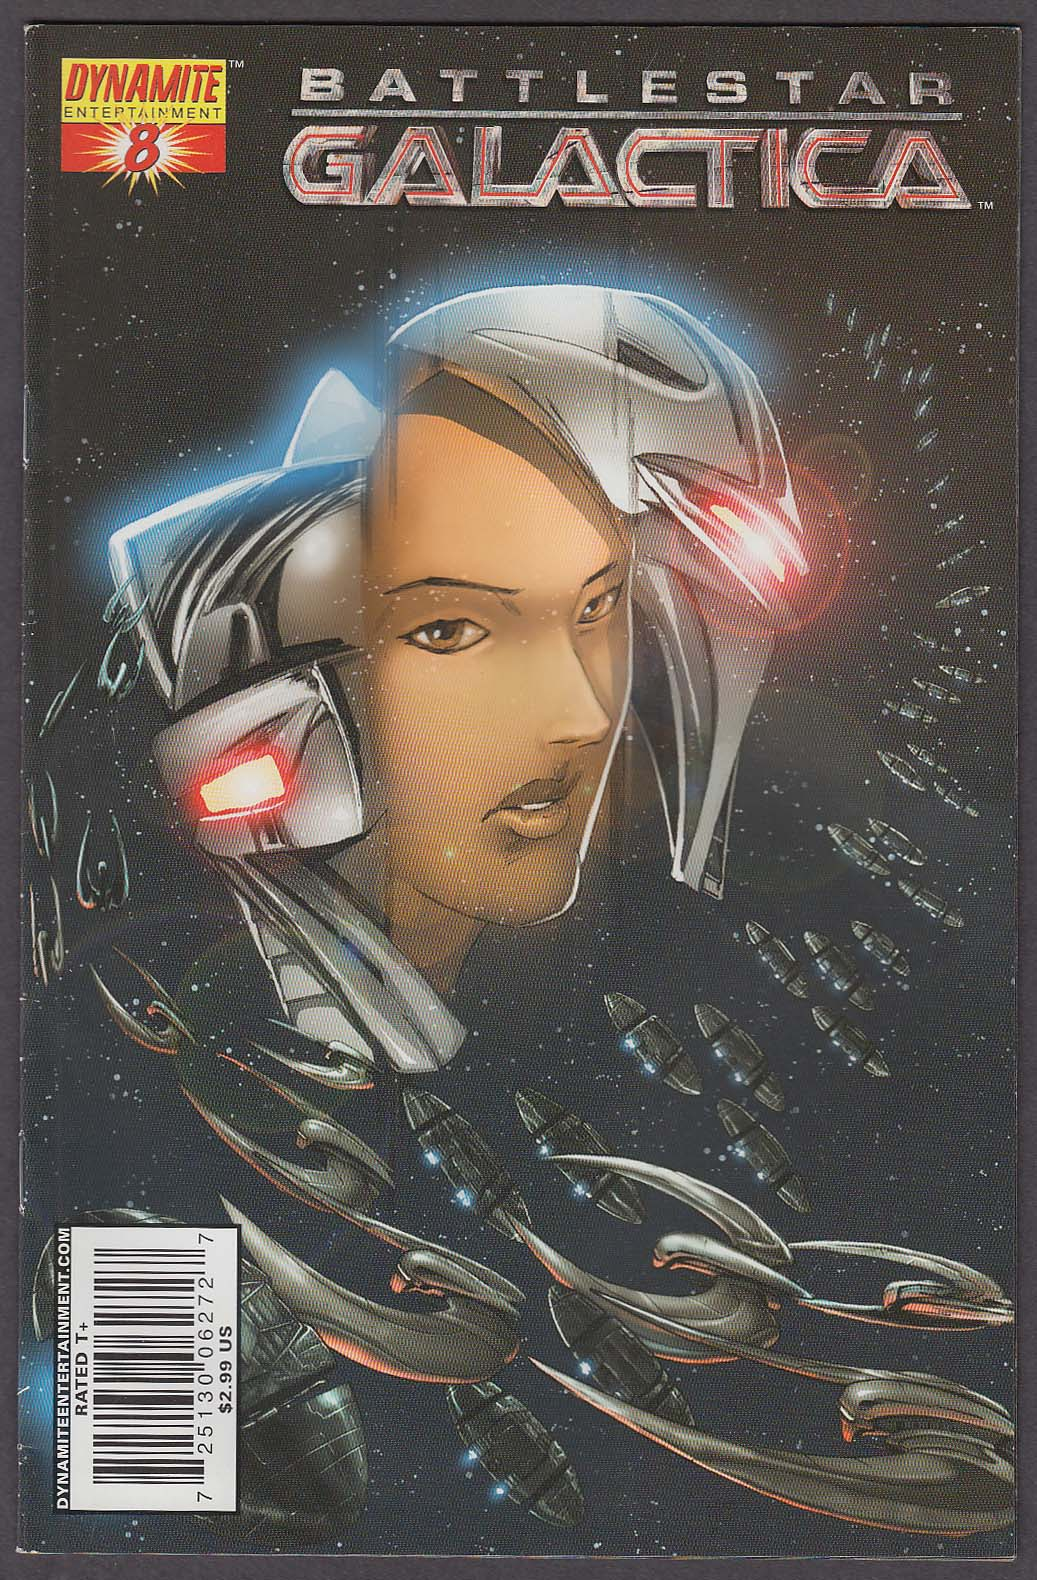 Image for BATTLESTAR GALACTICA #8 Dynamite comic book 2007 1st Printing